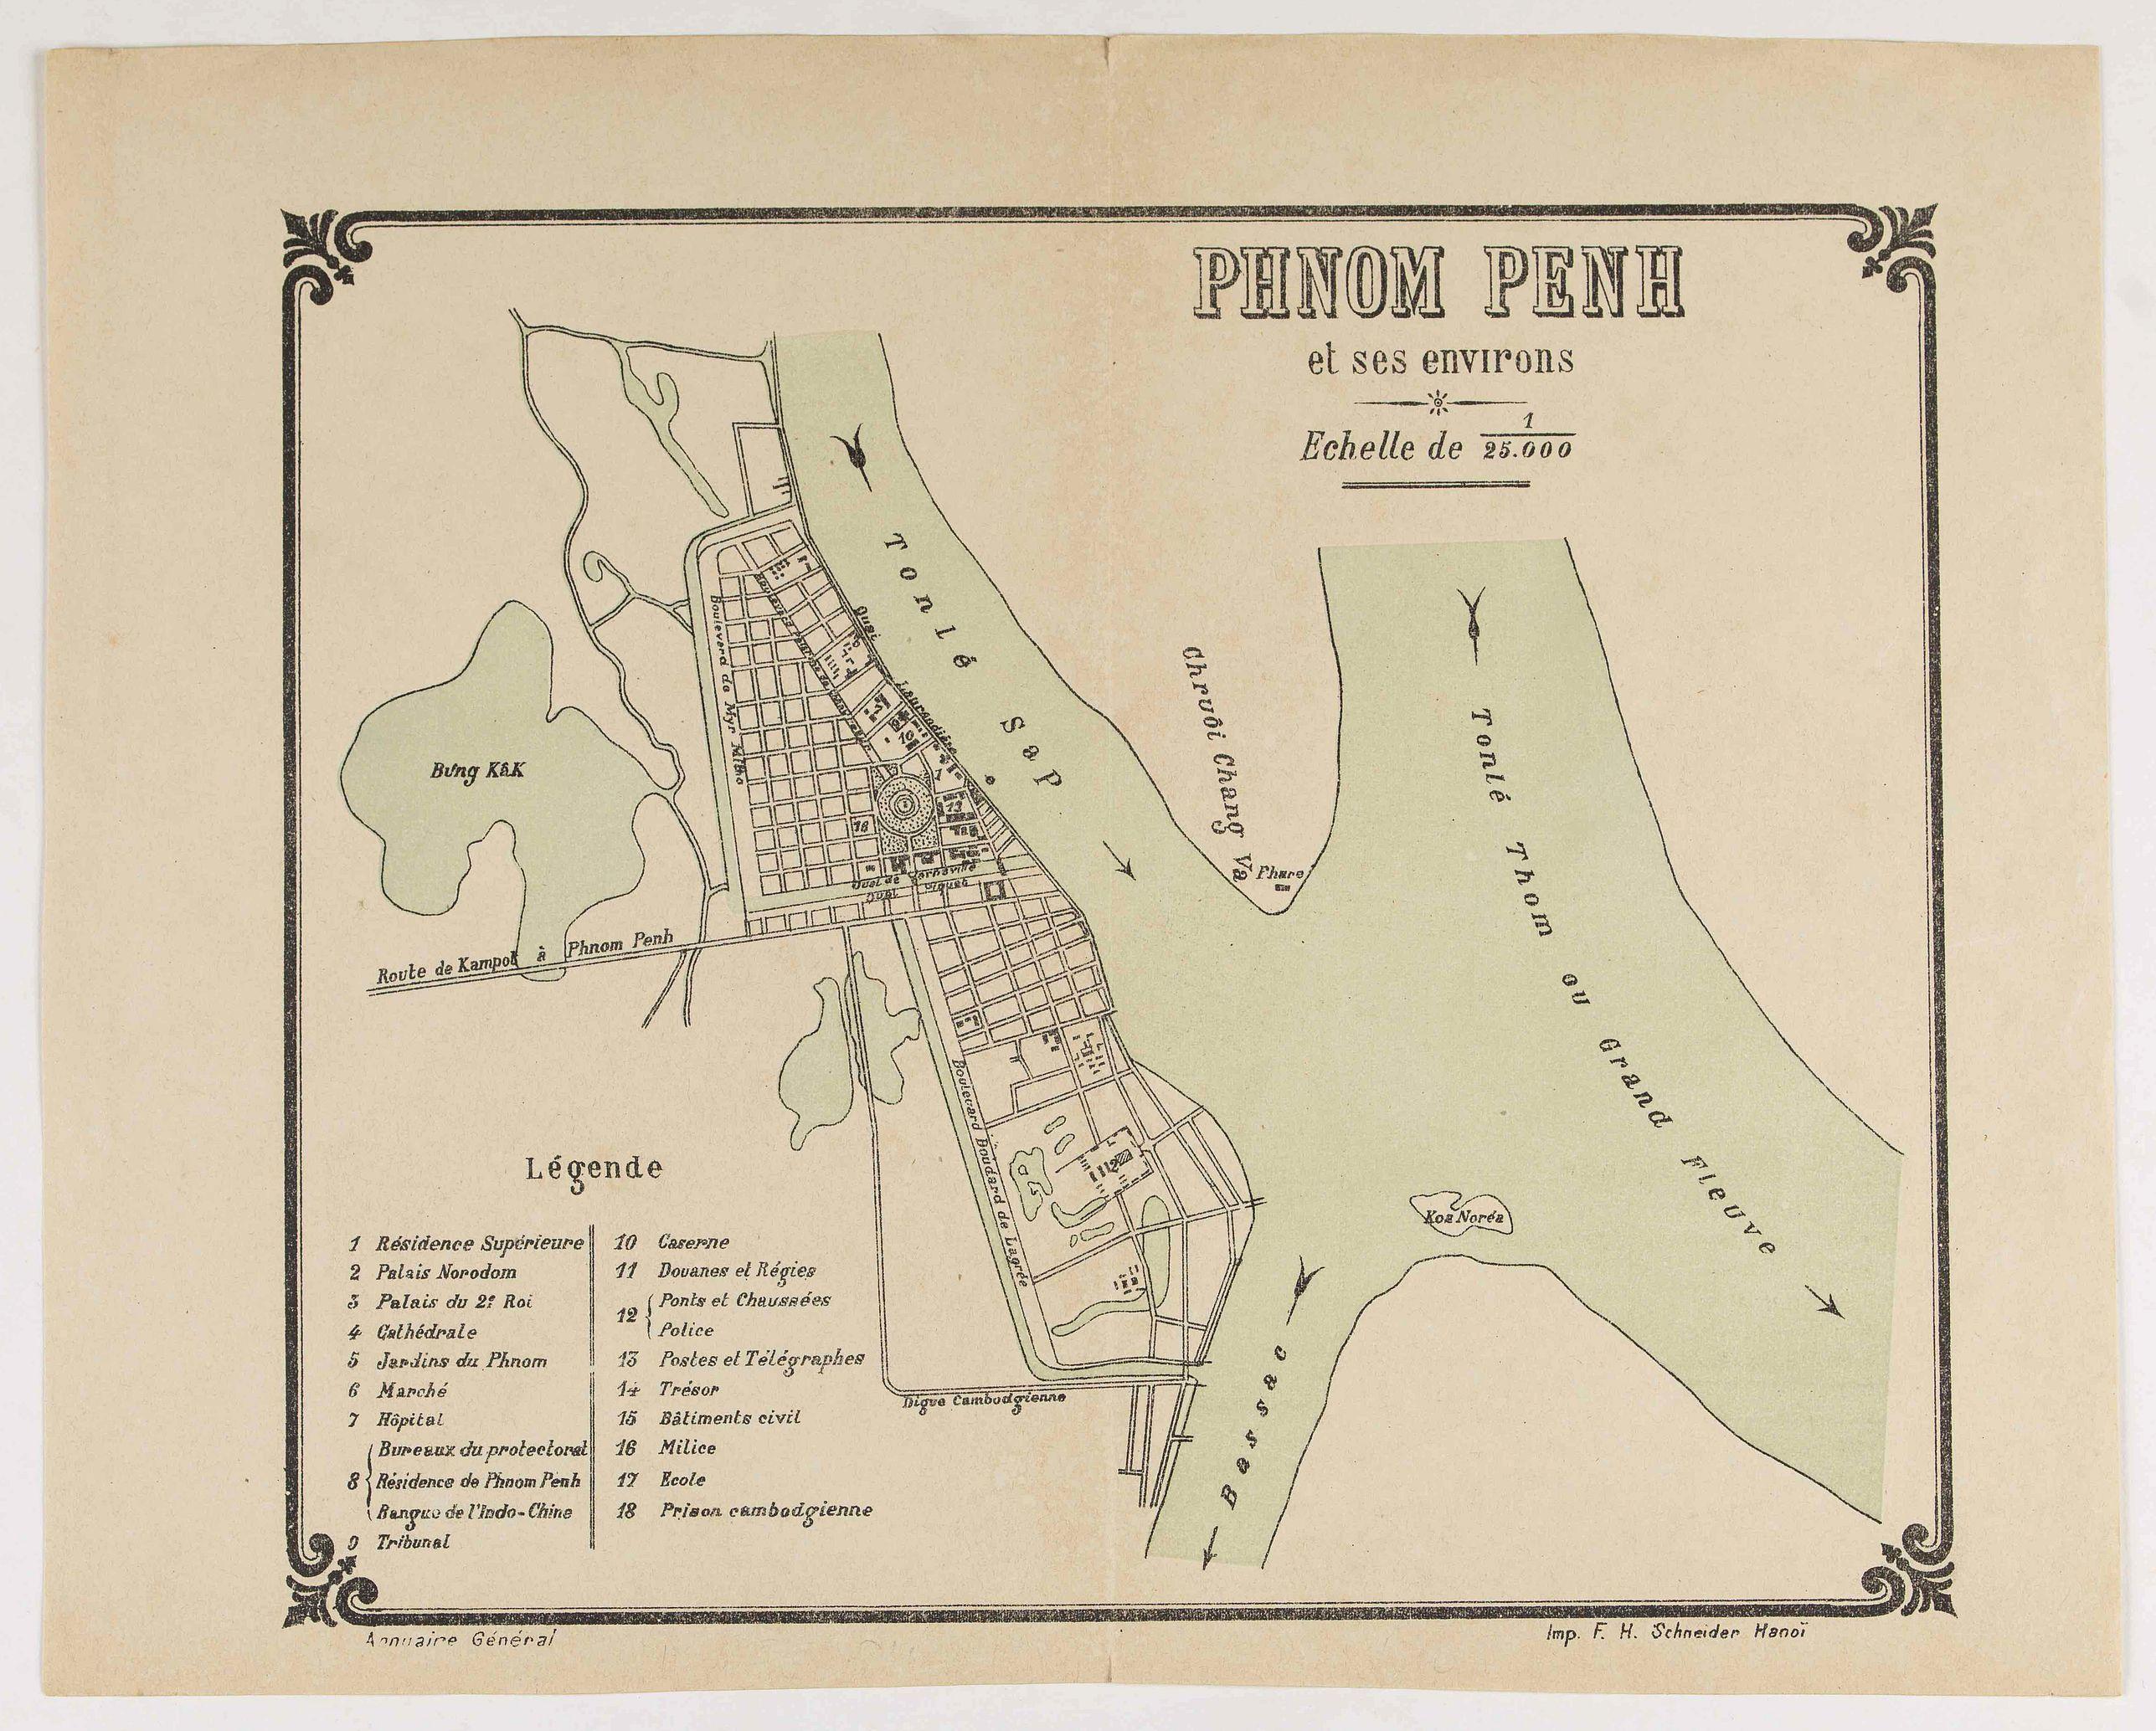 SCHNEIDER, F.H. - Plan Phnom Penh et ses environs.